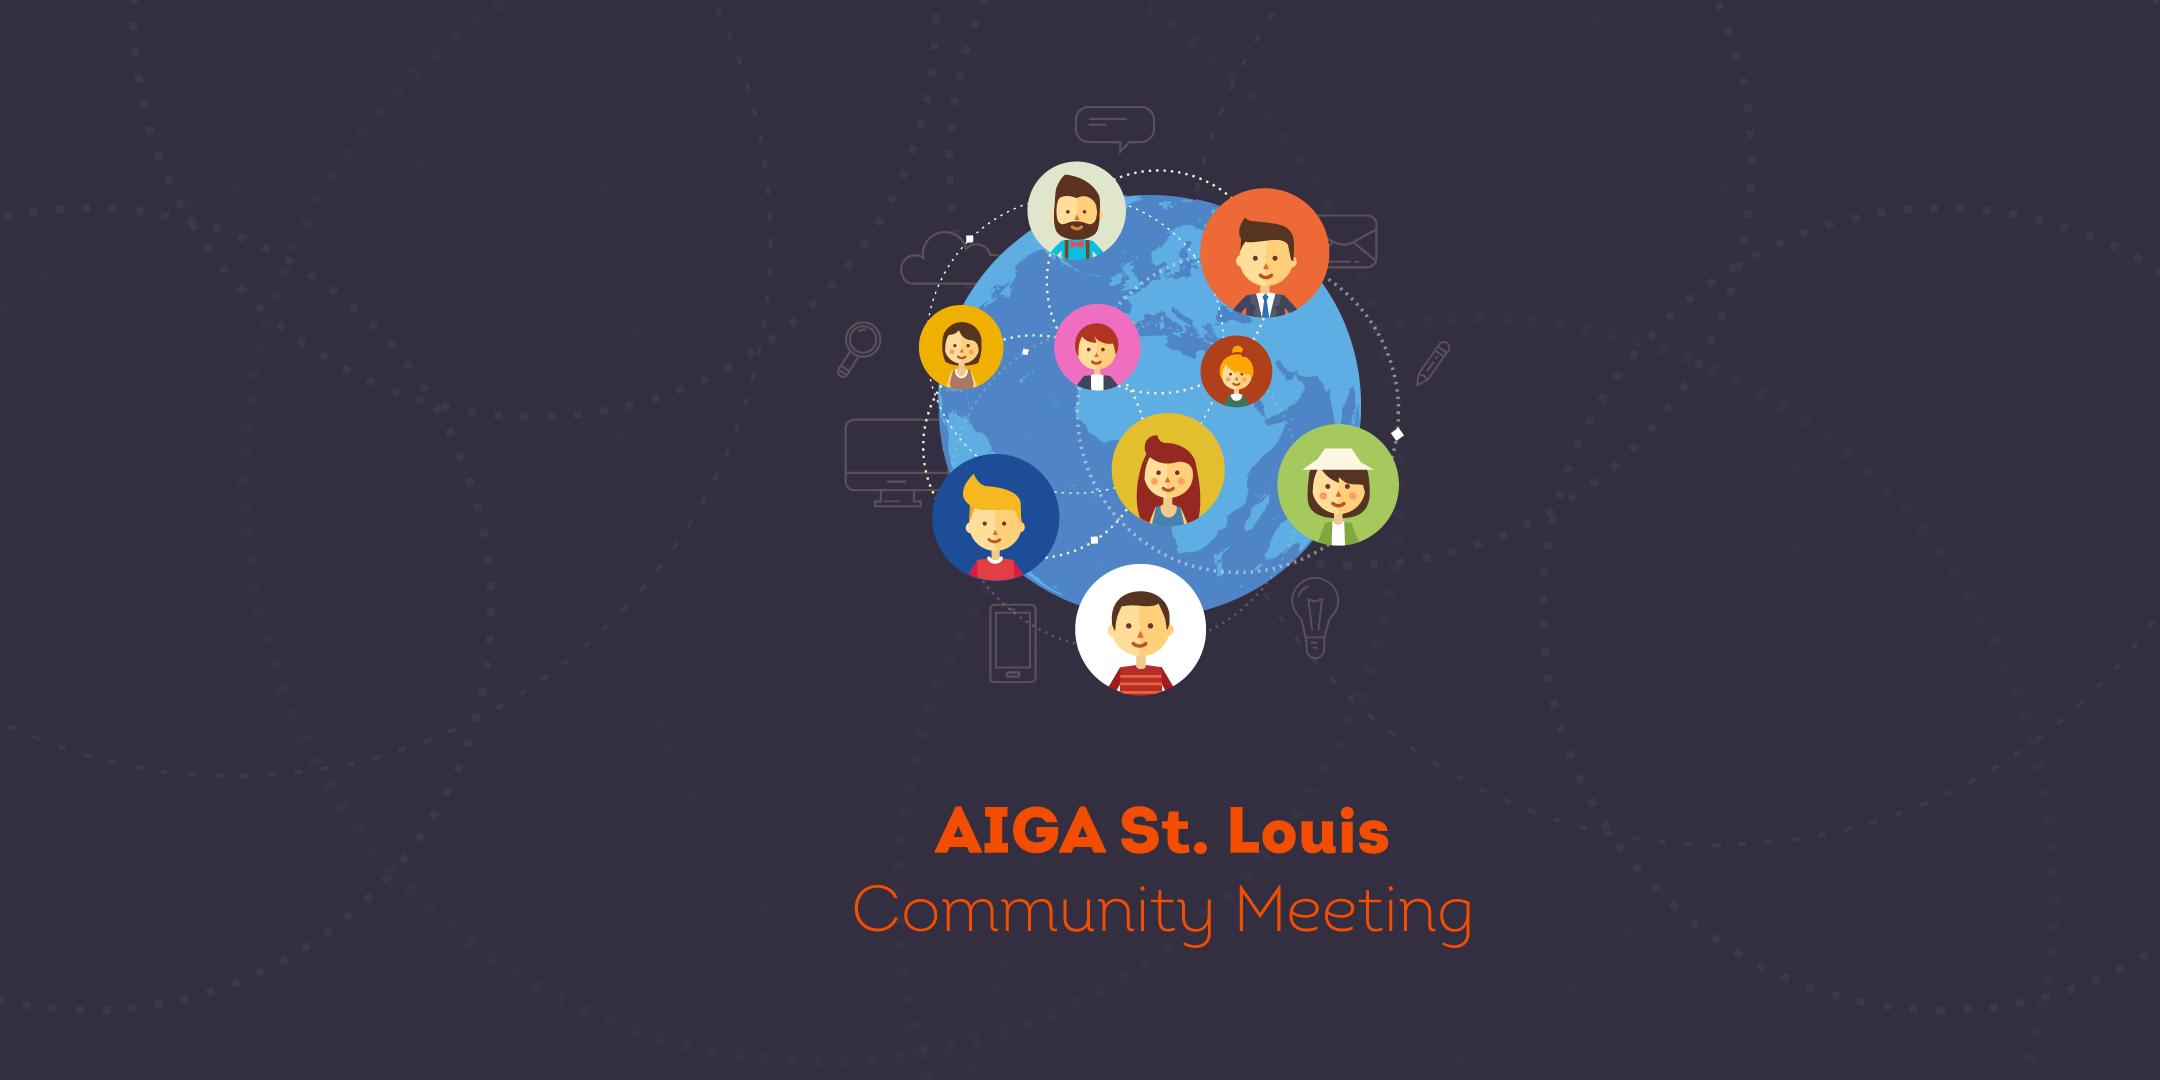 AIGA St. Louis Community Meeting